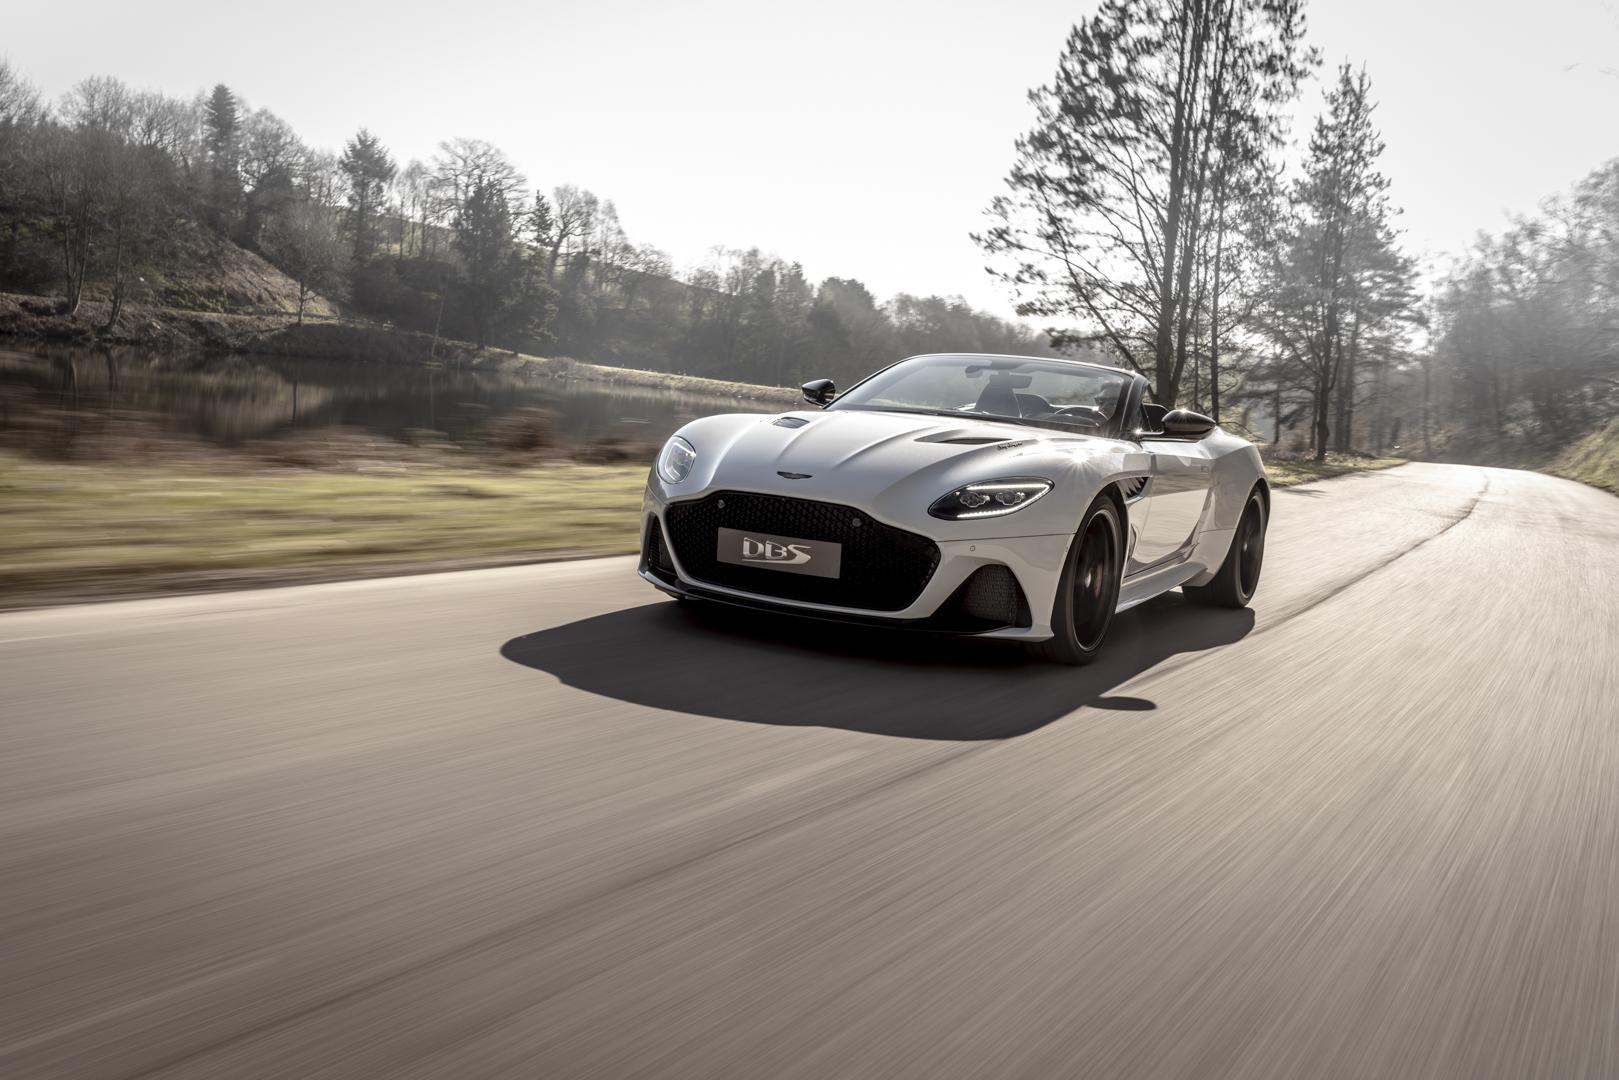 Aston Martin DBS Superleggera Volante 1 of 3